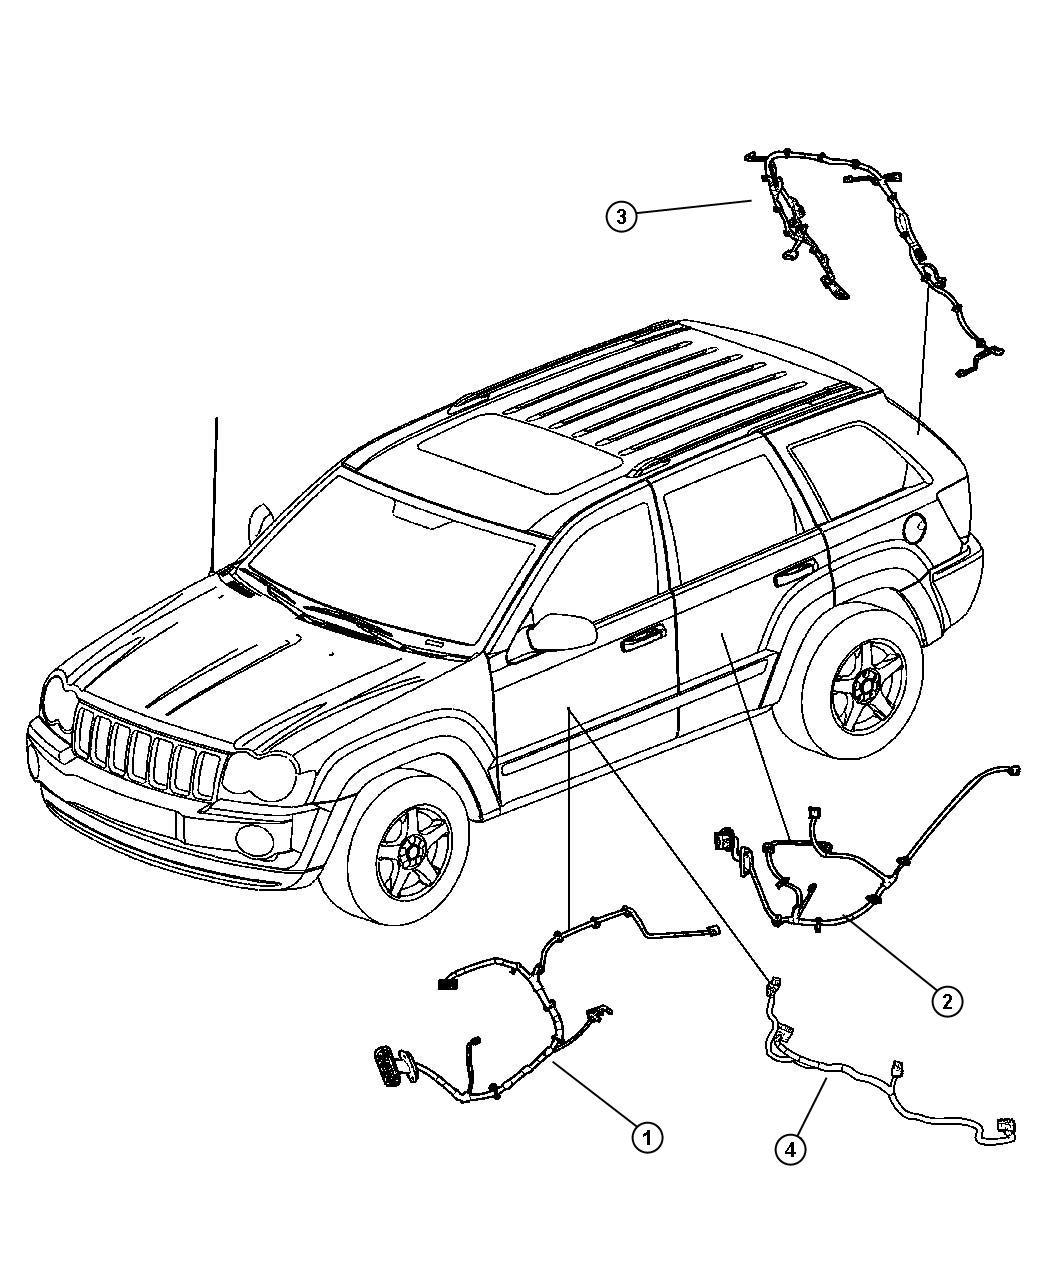 Jeep Grand Cherokee Infinity Wiring